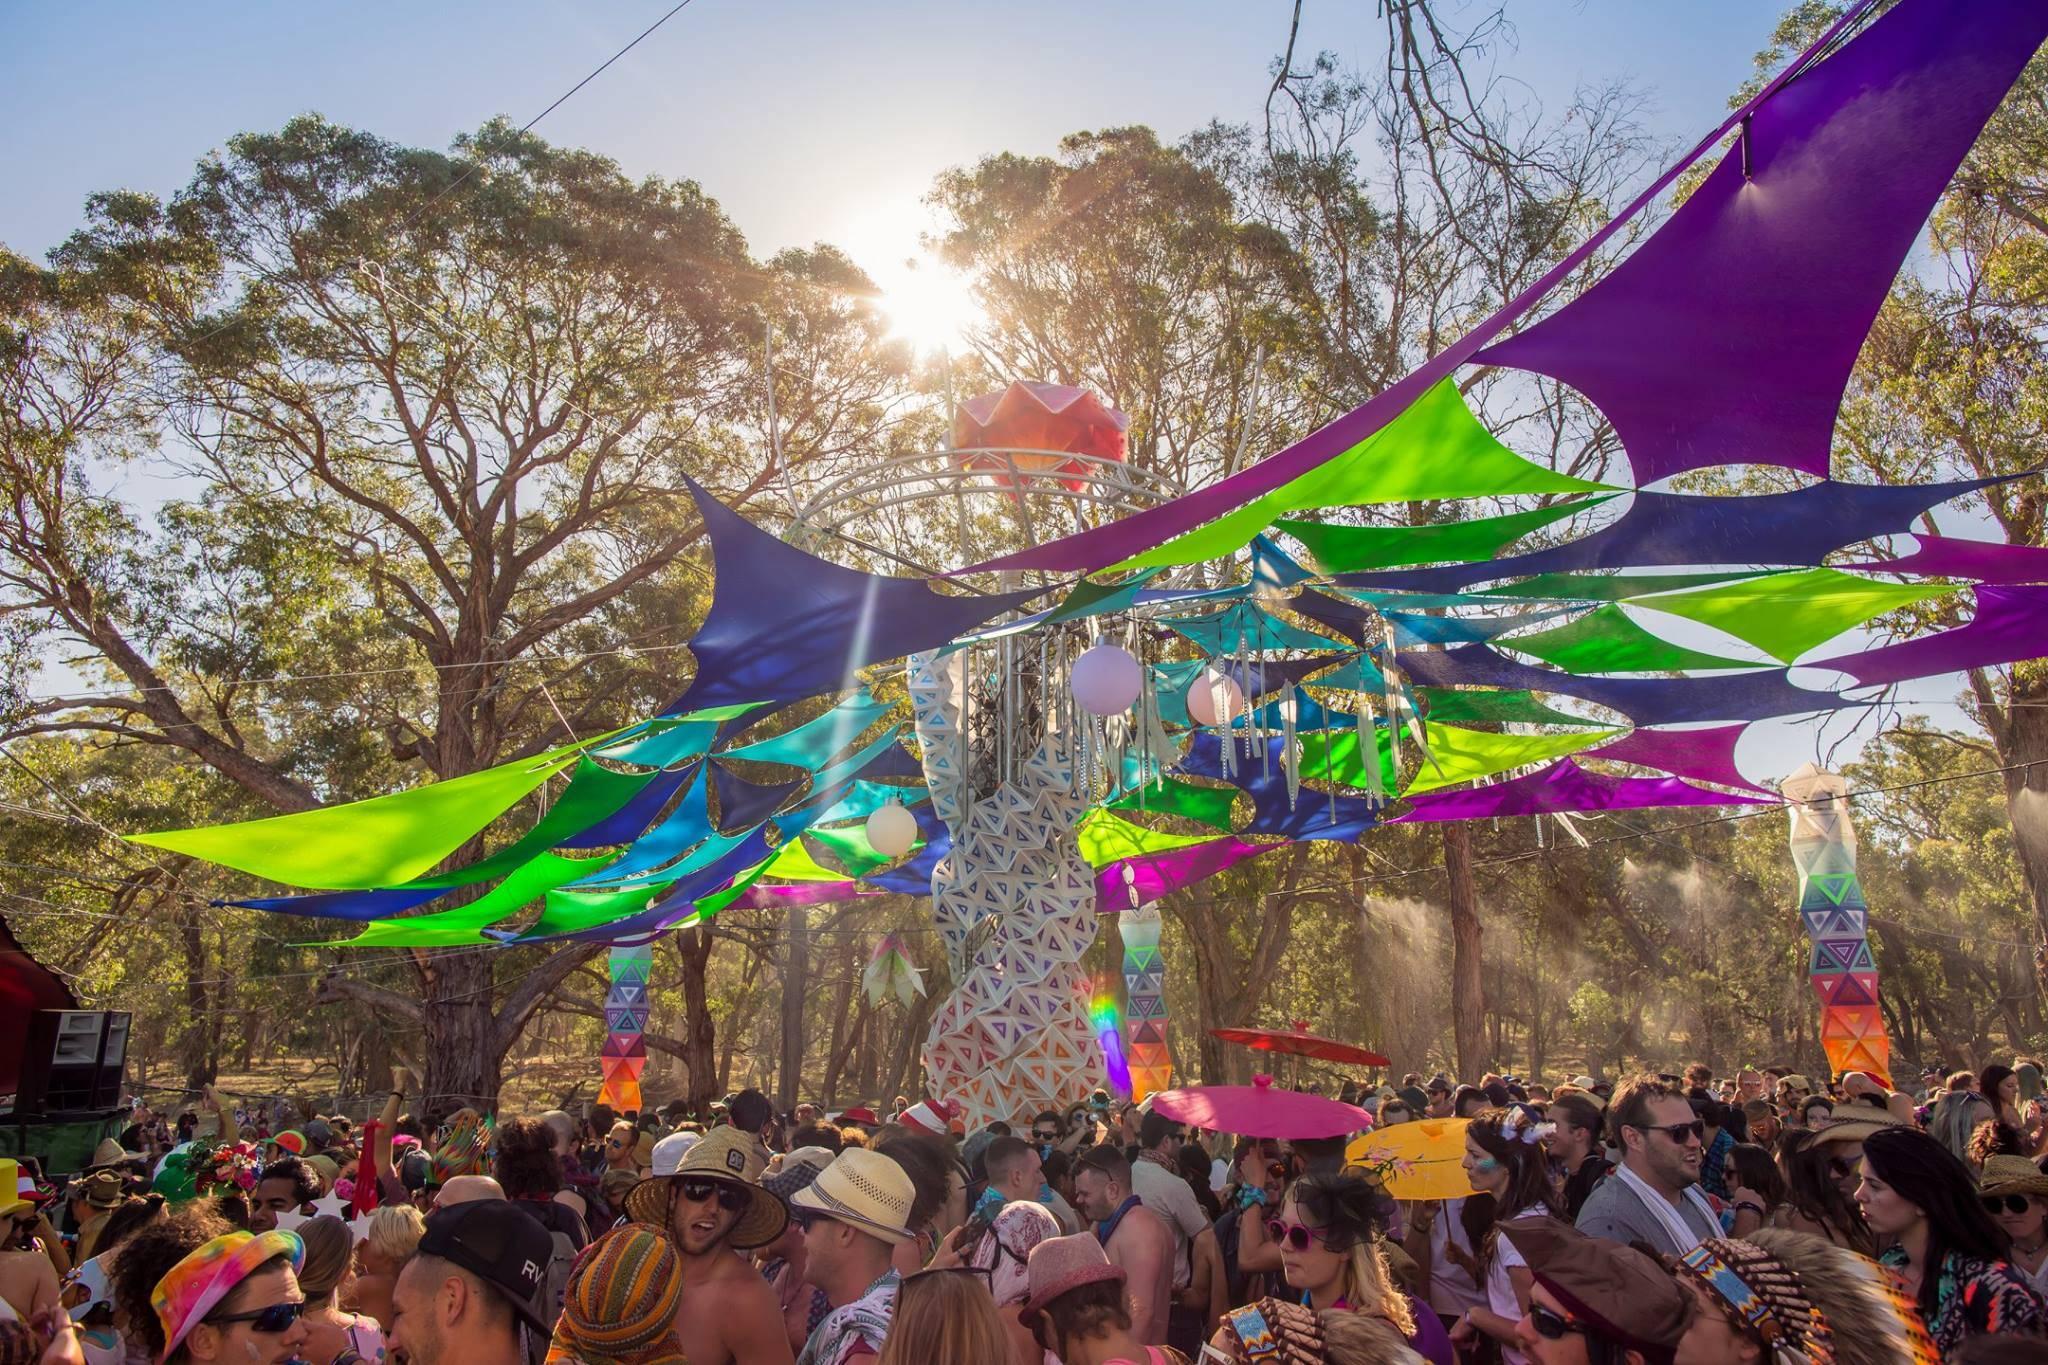 Rainbow Serpent 2015 - dancefloor with sun through deco